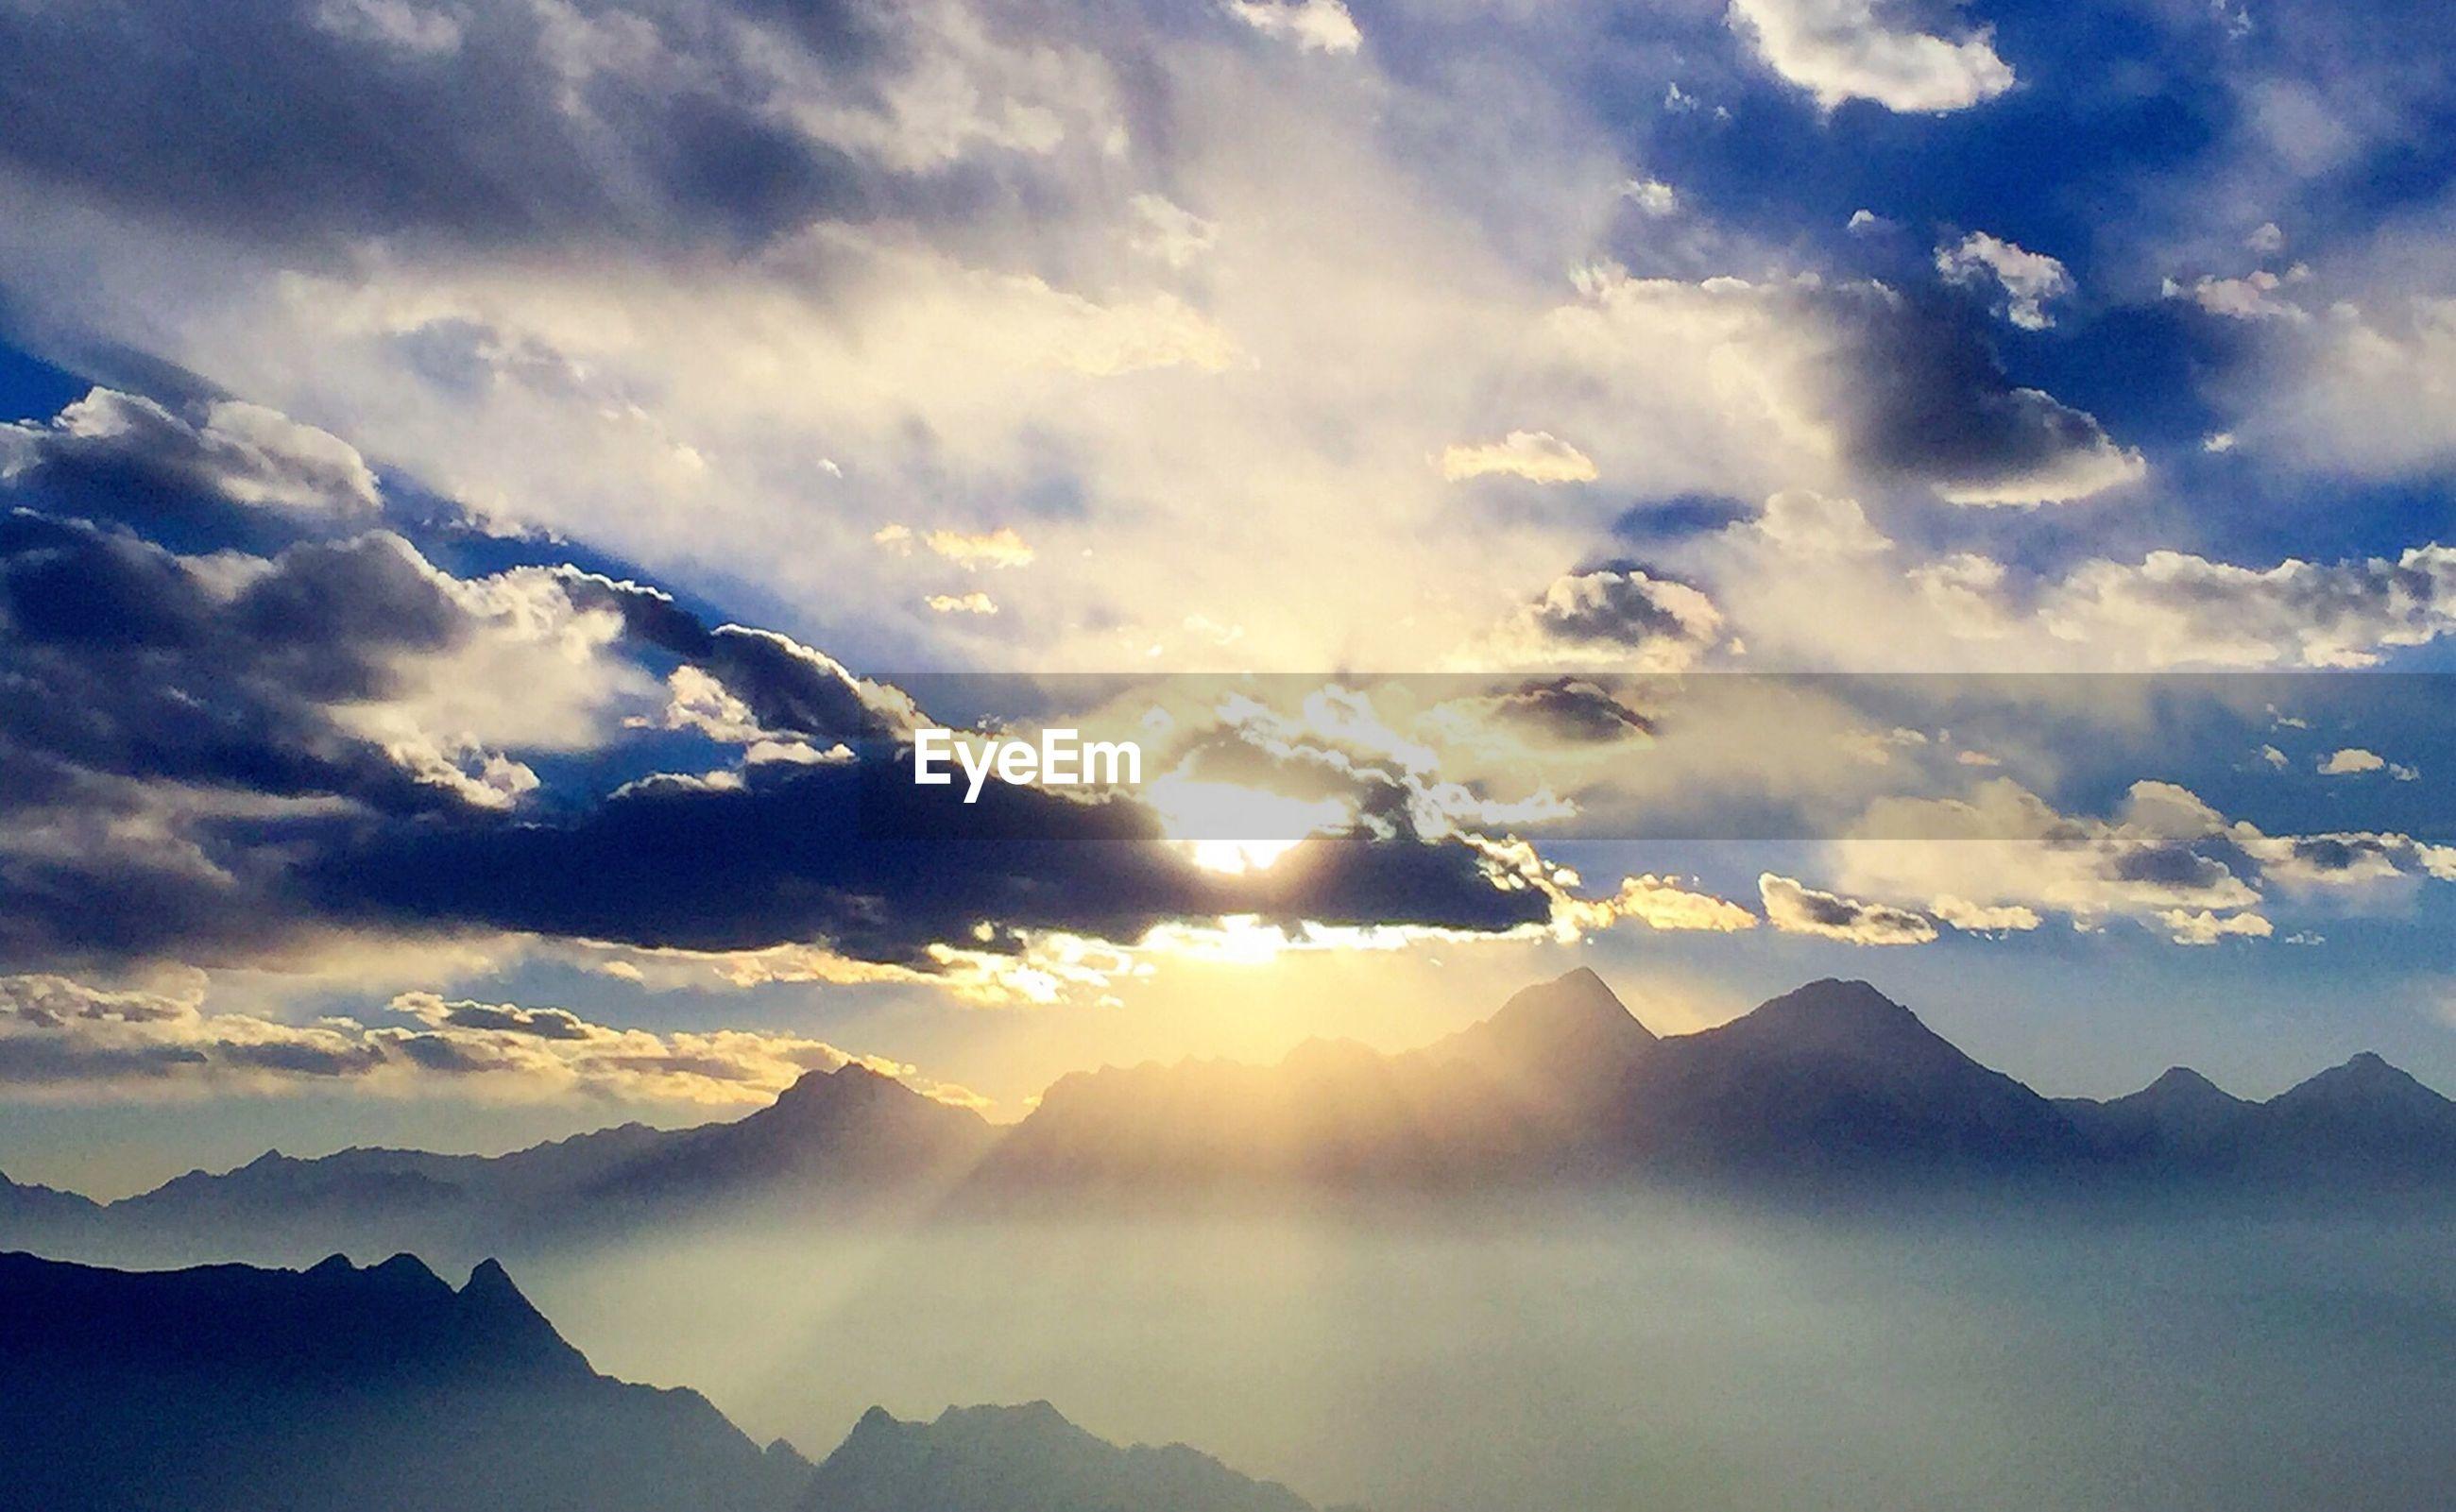 scenics, tranquil scene, mountain, beauty in nature, tranquility, sky, mountain range, cloud - sky, nature, sunset, sun, landscape, idyllic, sunbeam, cloud, sunlight, cloudy, majestic, silhouette, non-urban scene